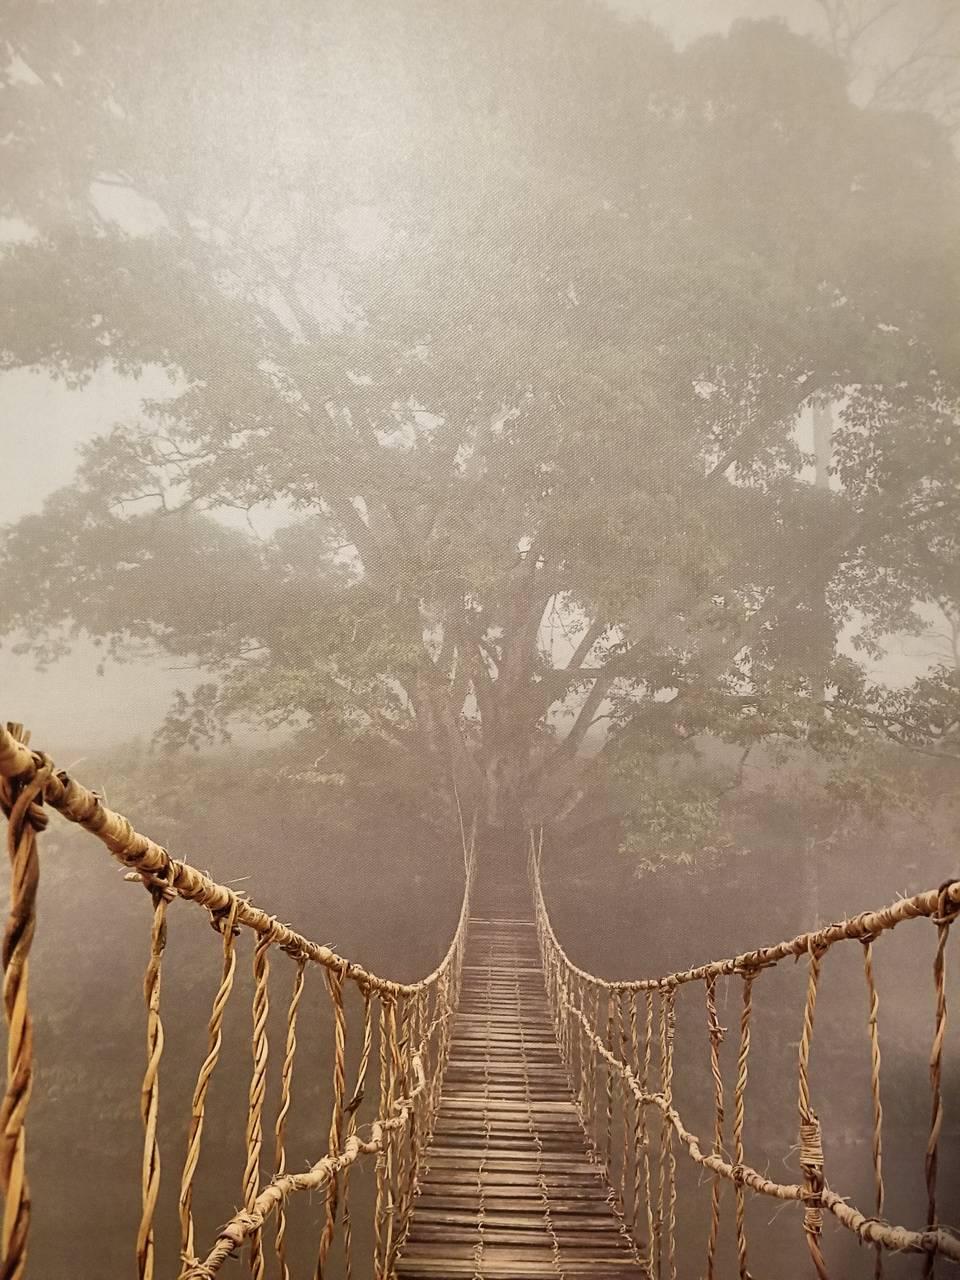 Rope drawbridge